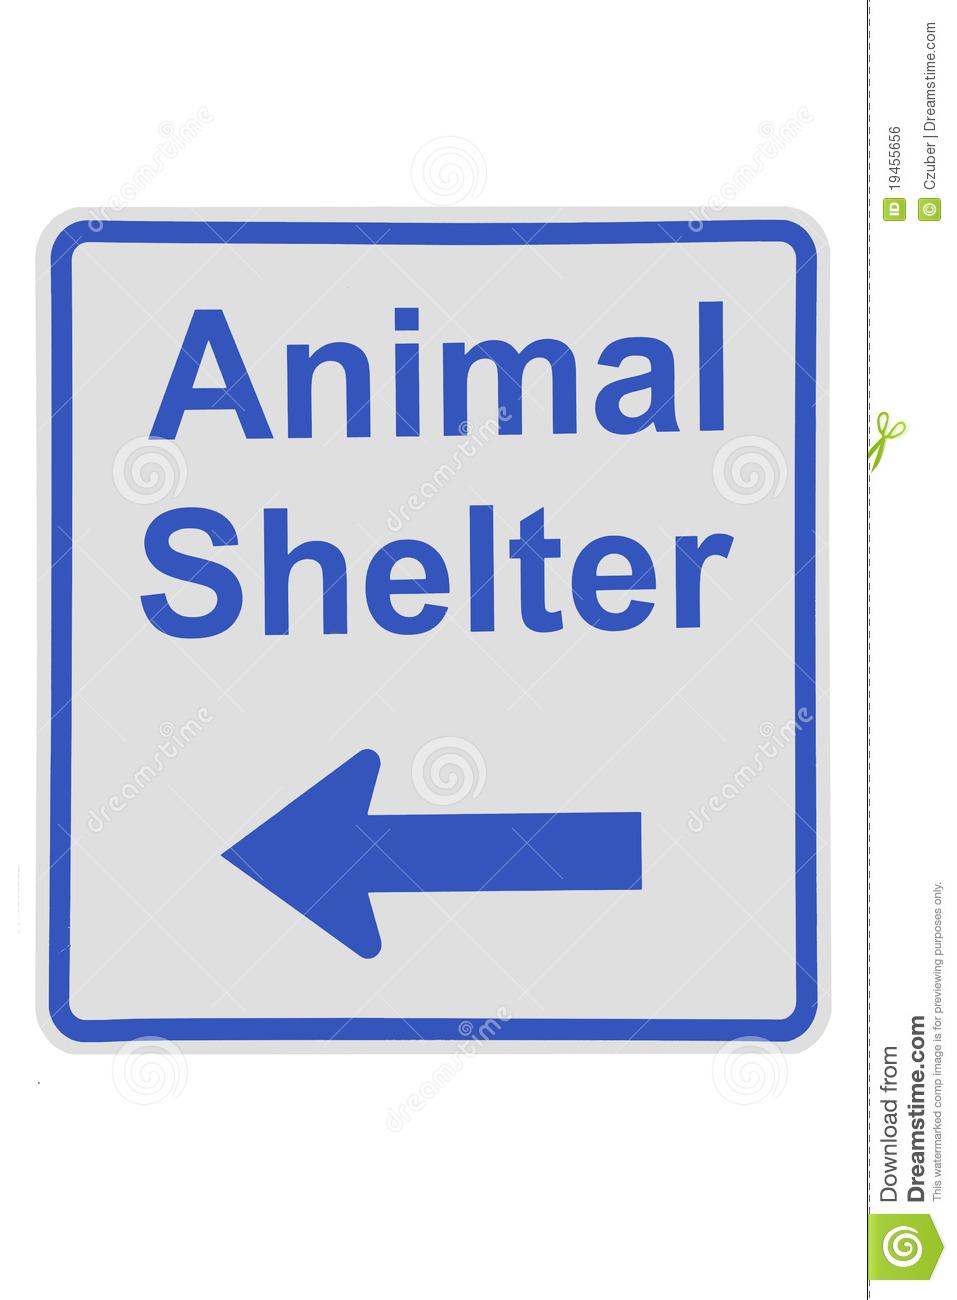 Animal Shelter Sign Royalty Free Stock Image Image 19455656